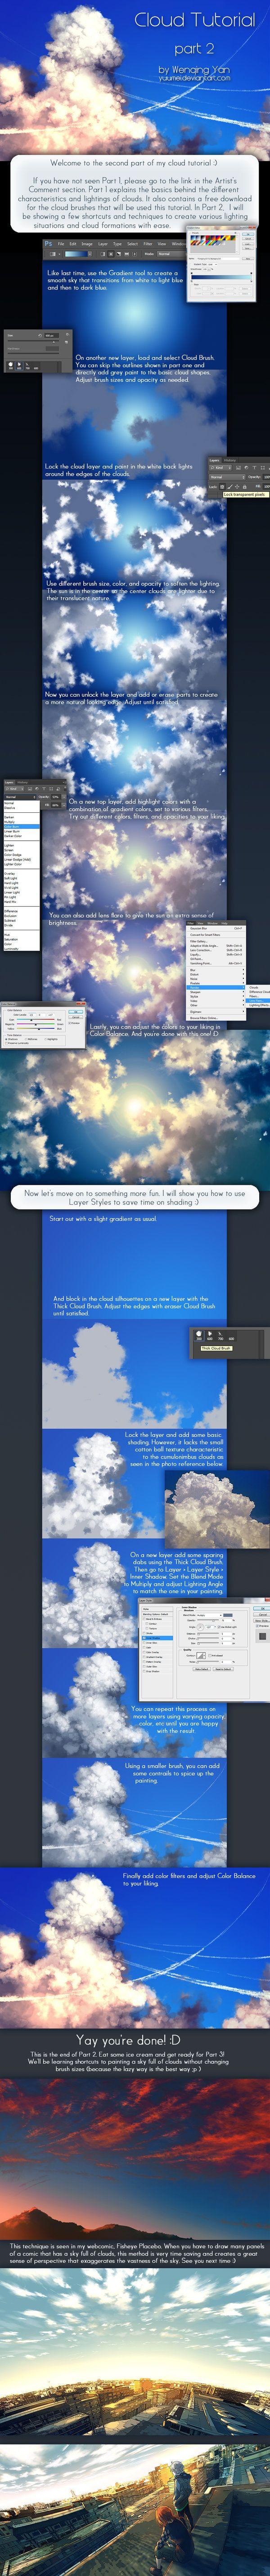 Cloud Tutorial Part 2 by yuumei.deviantart.com on @deviantART